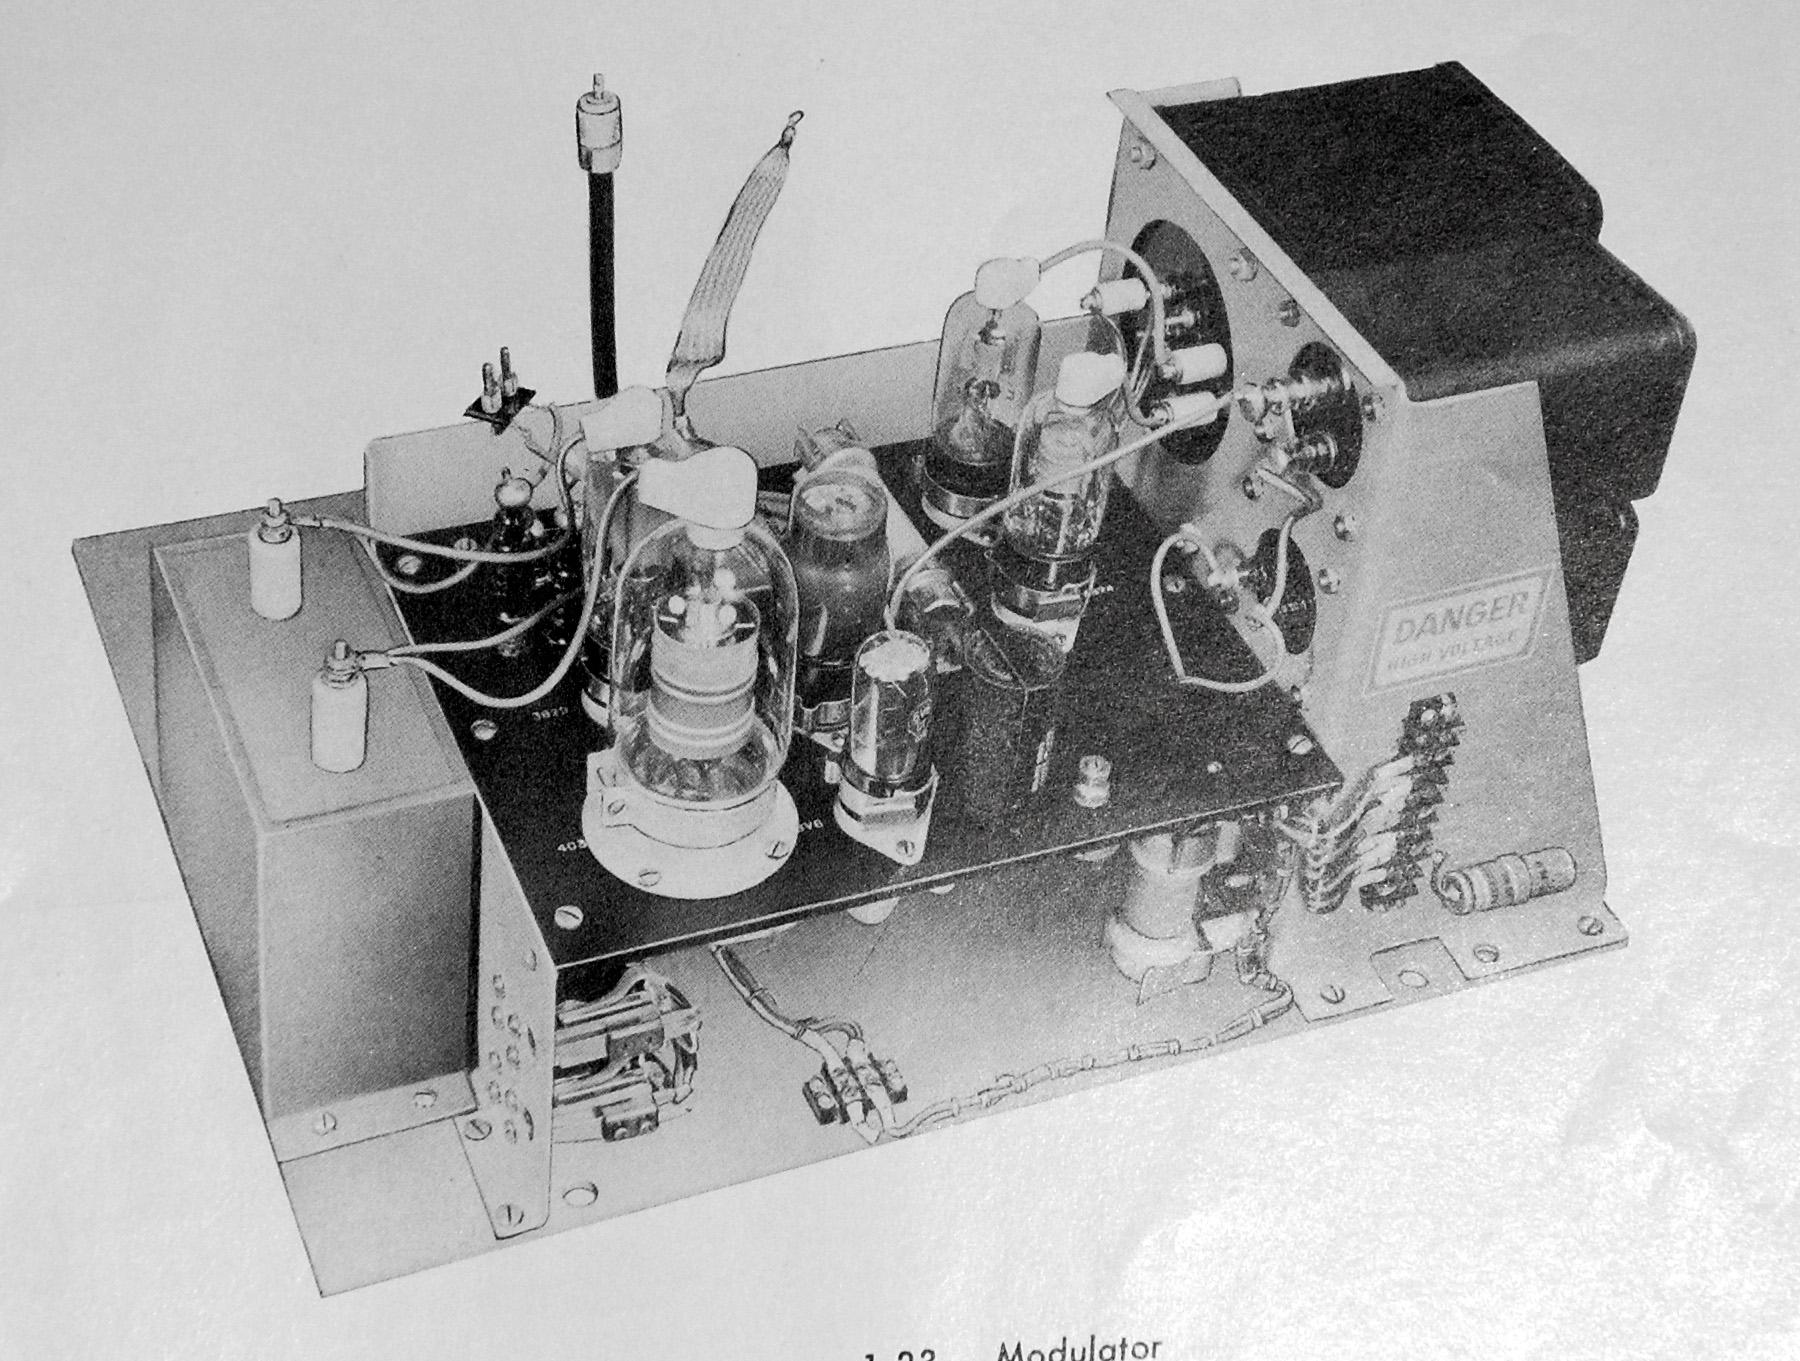 asdic radar and iff systems aboard hmcs haida part 9 of 10 image courtesy sperry marine